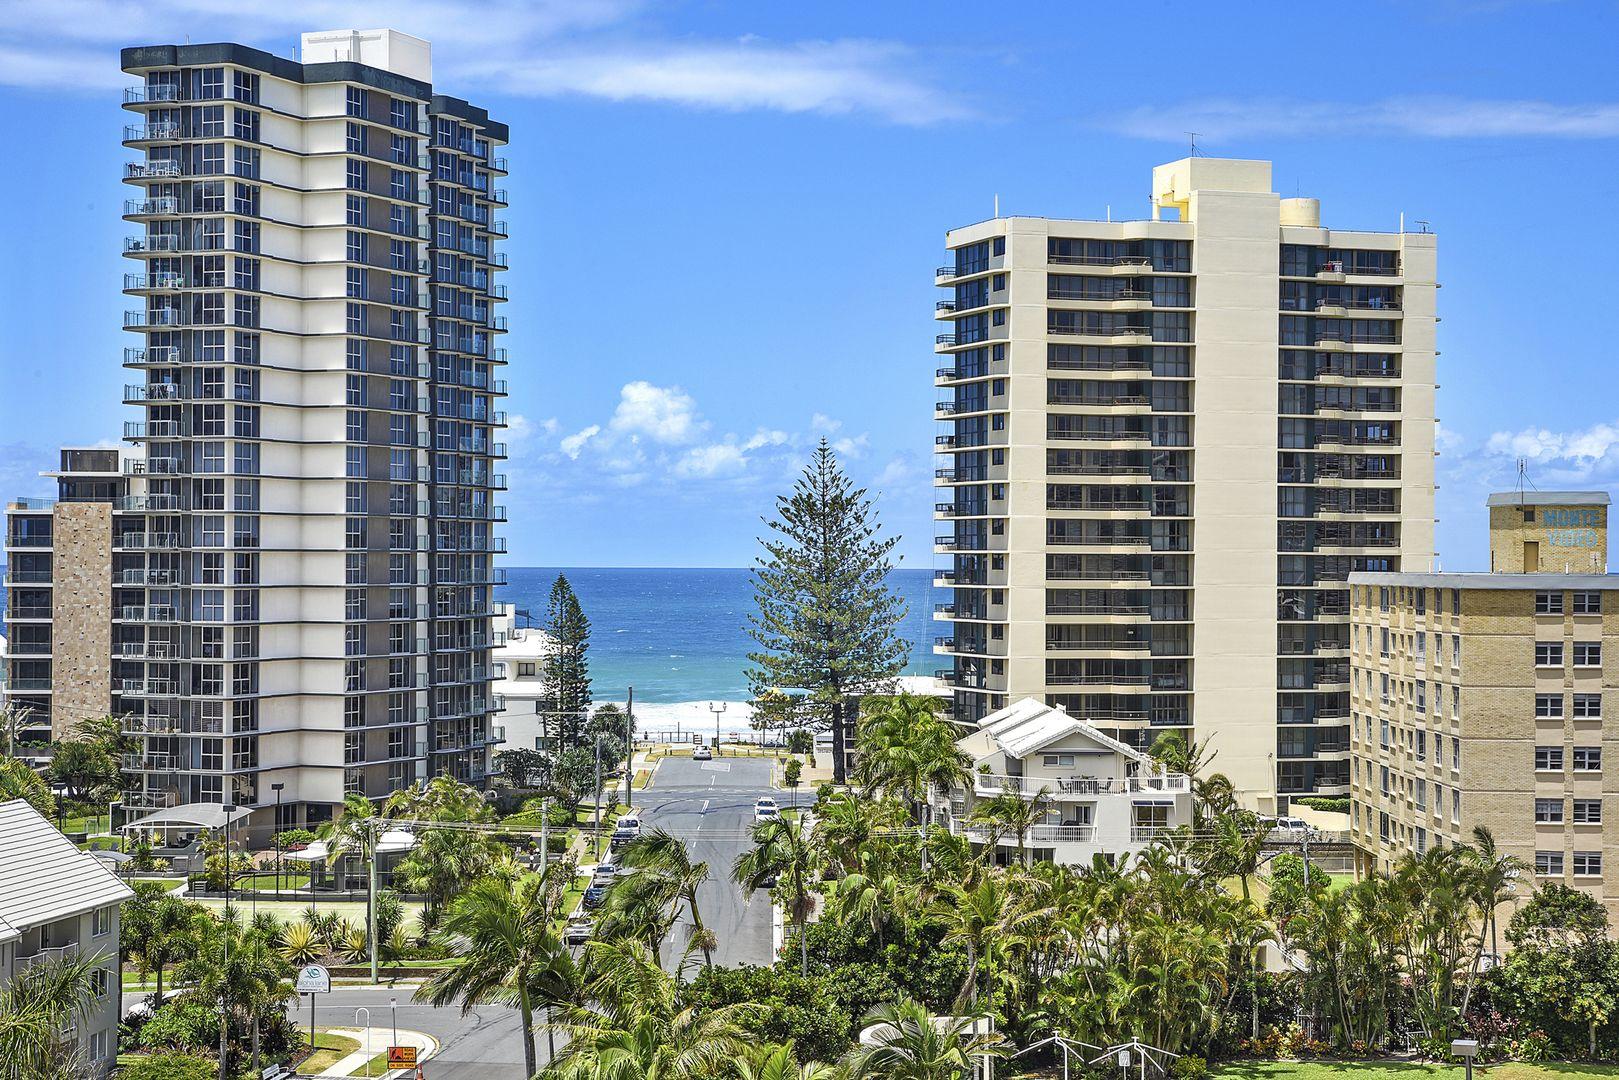 7A/24 Breaker Street, Main Beach QLD 4217, Image 1